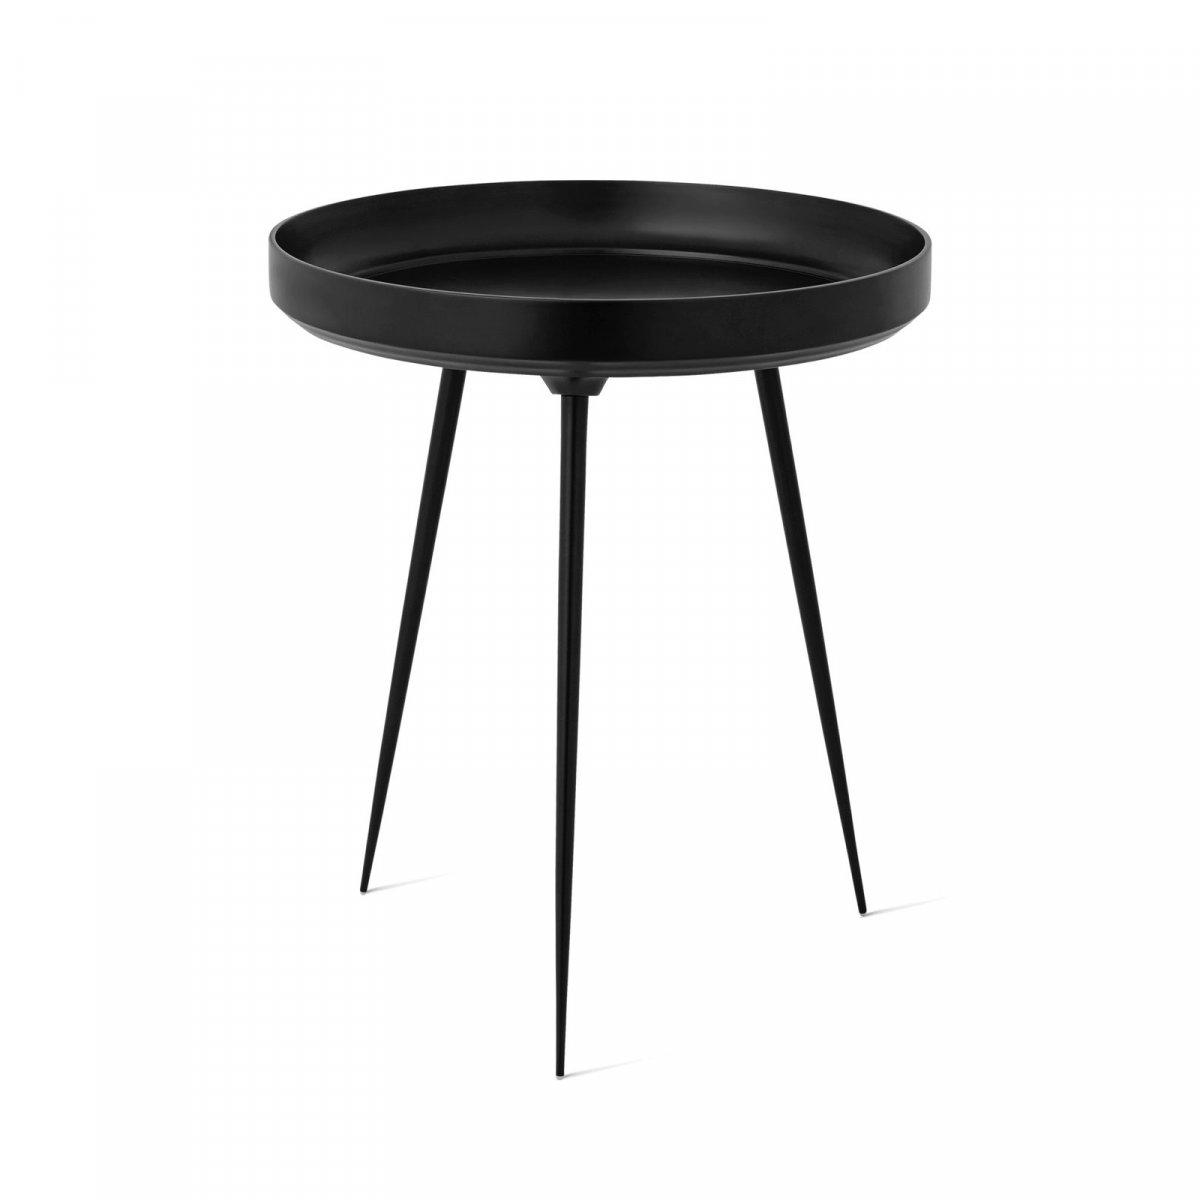 Alu Bowl Table, black.